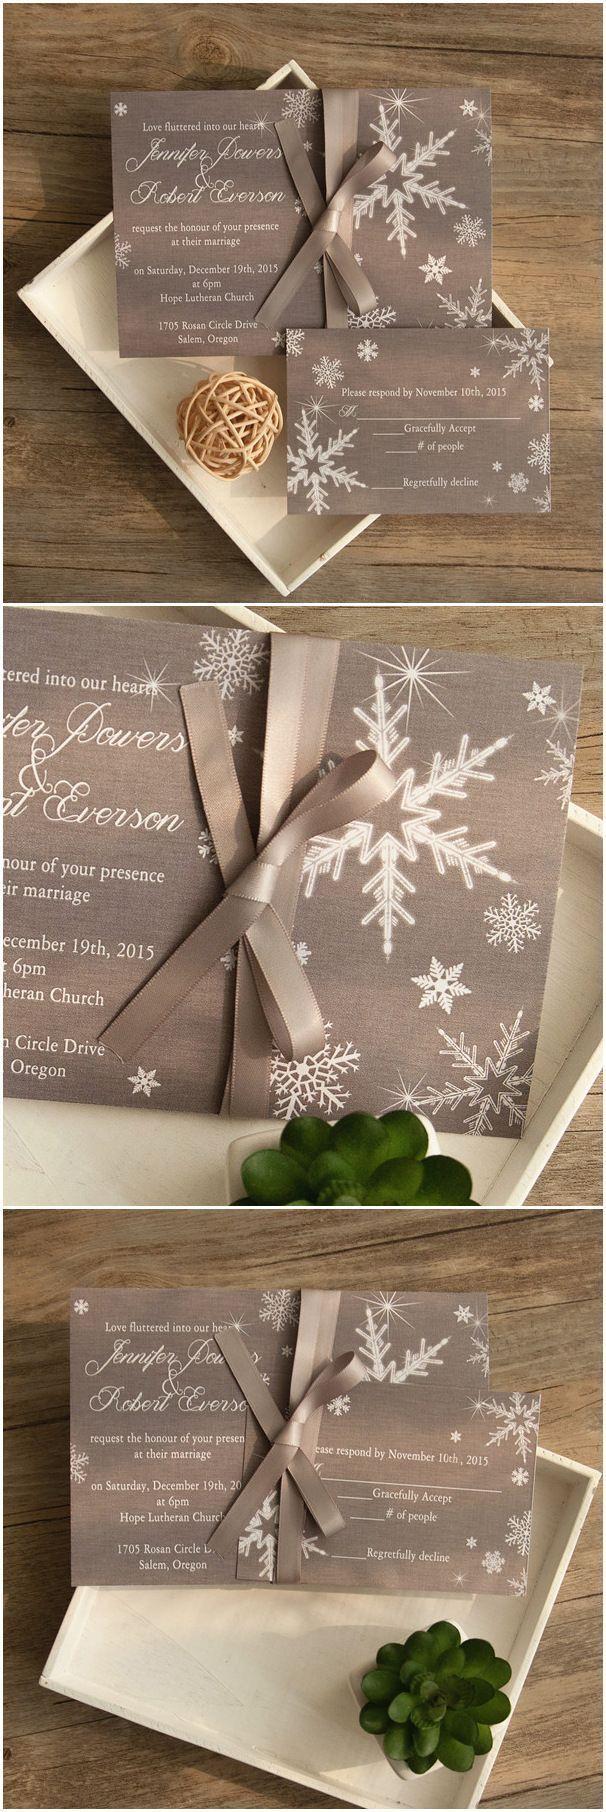 Vintage Winter Wedding Invitations PaperInvite